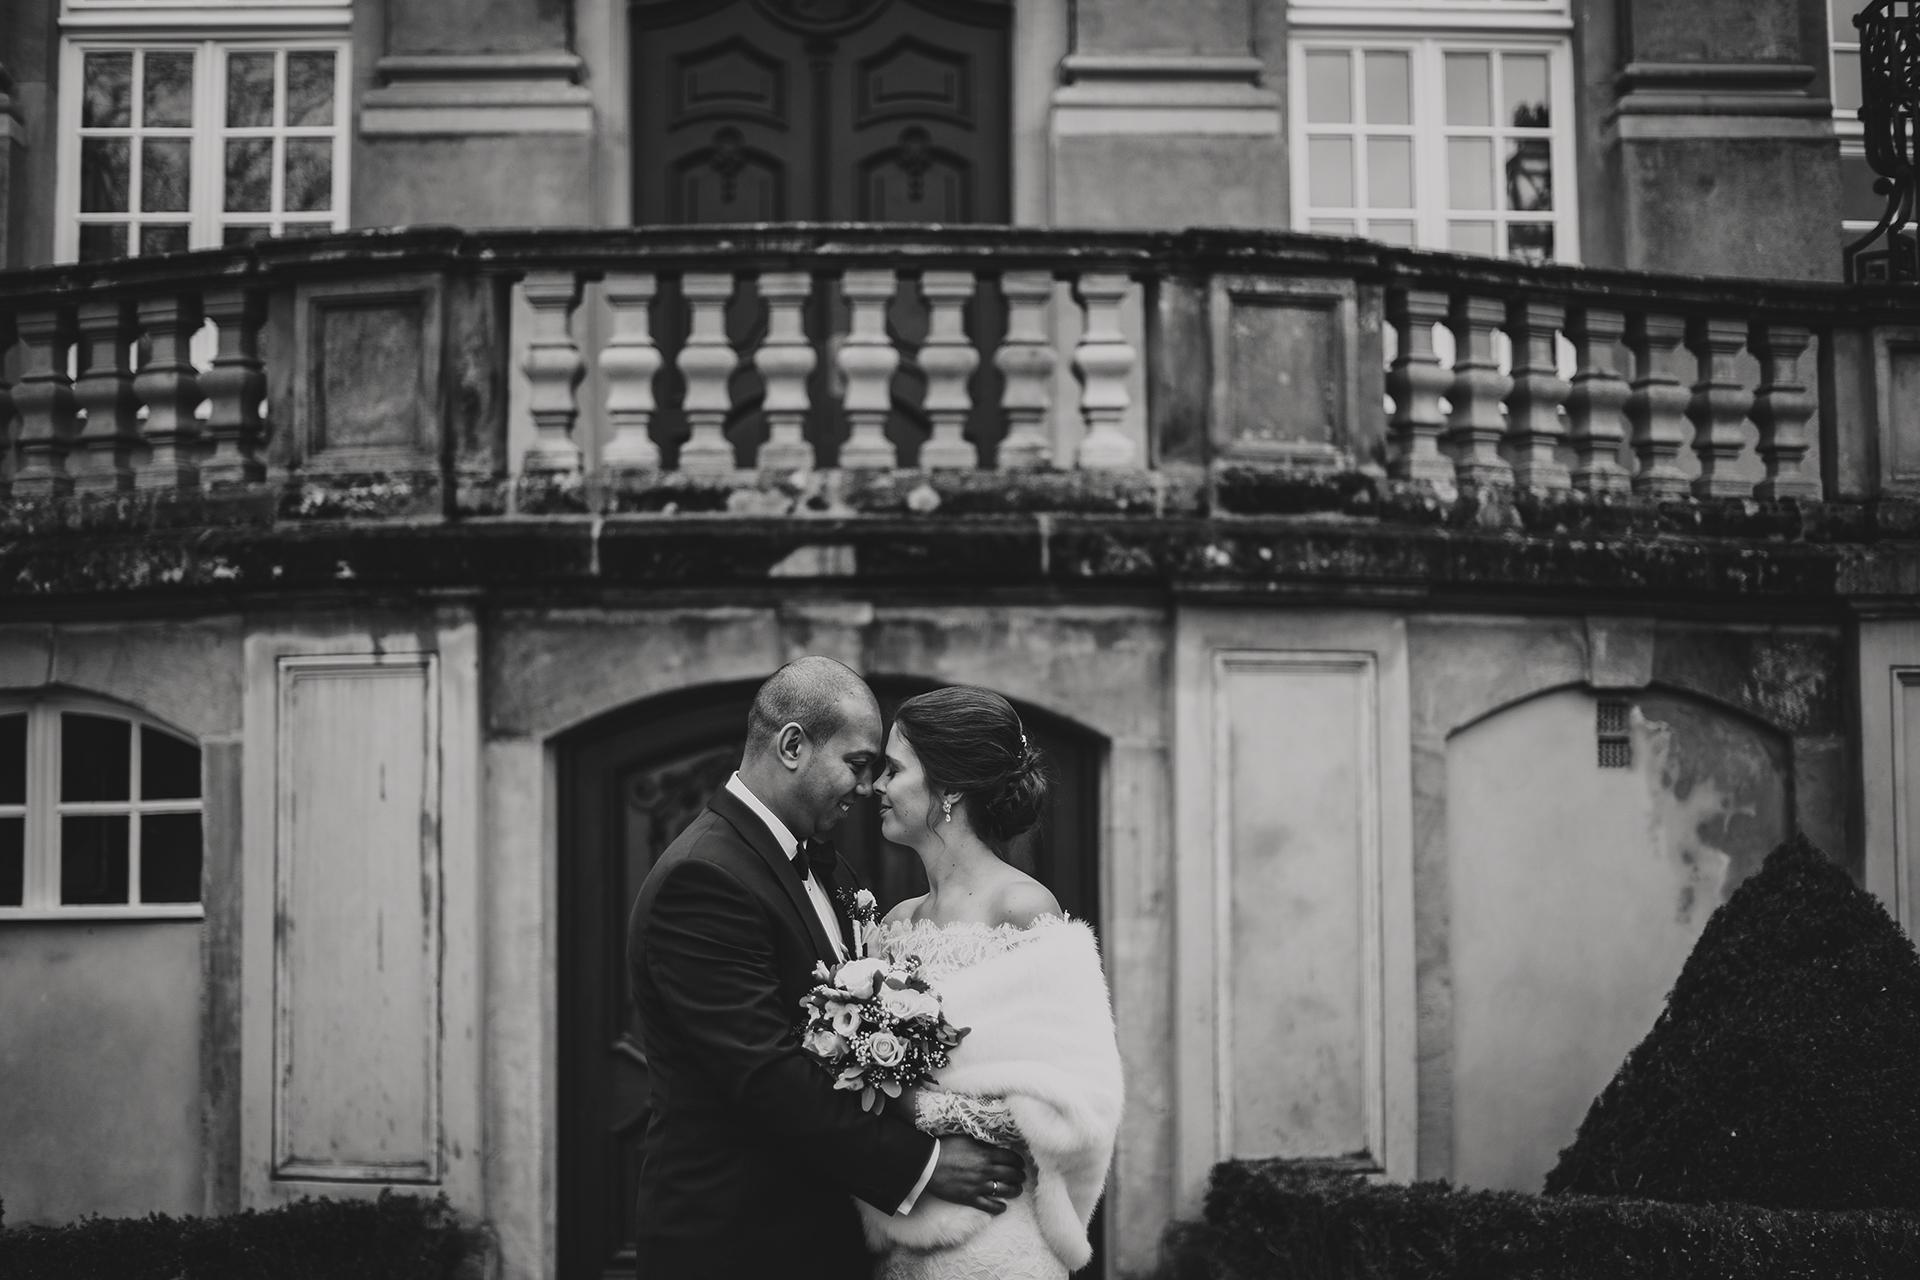 Hochzeitsreportage_J&D_061_Caroline Queda Fotografie